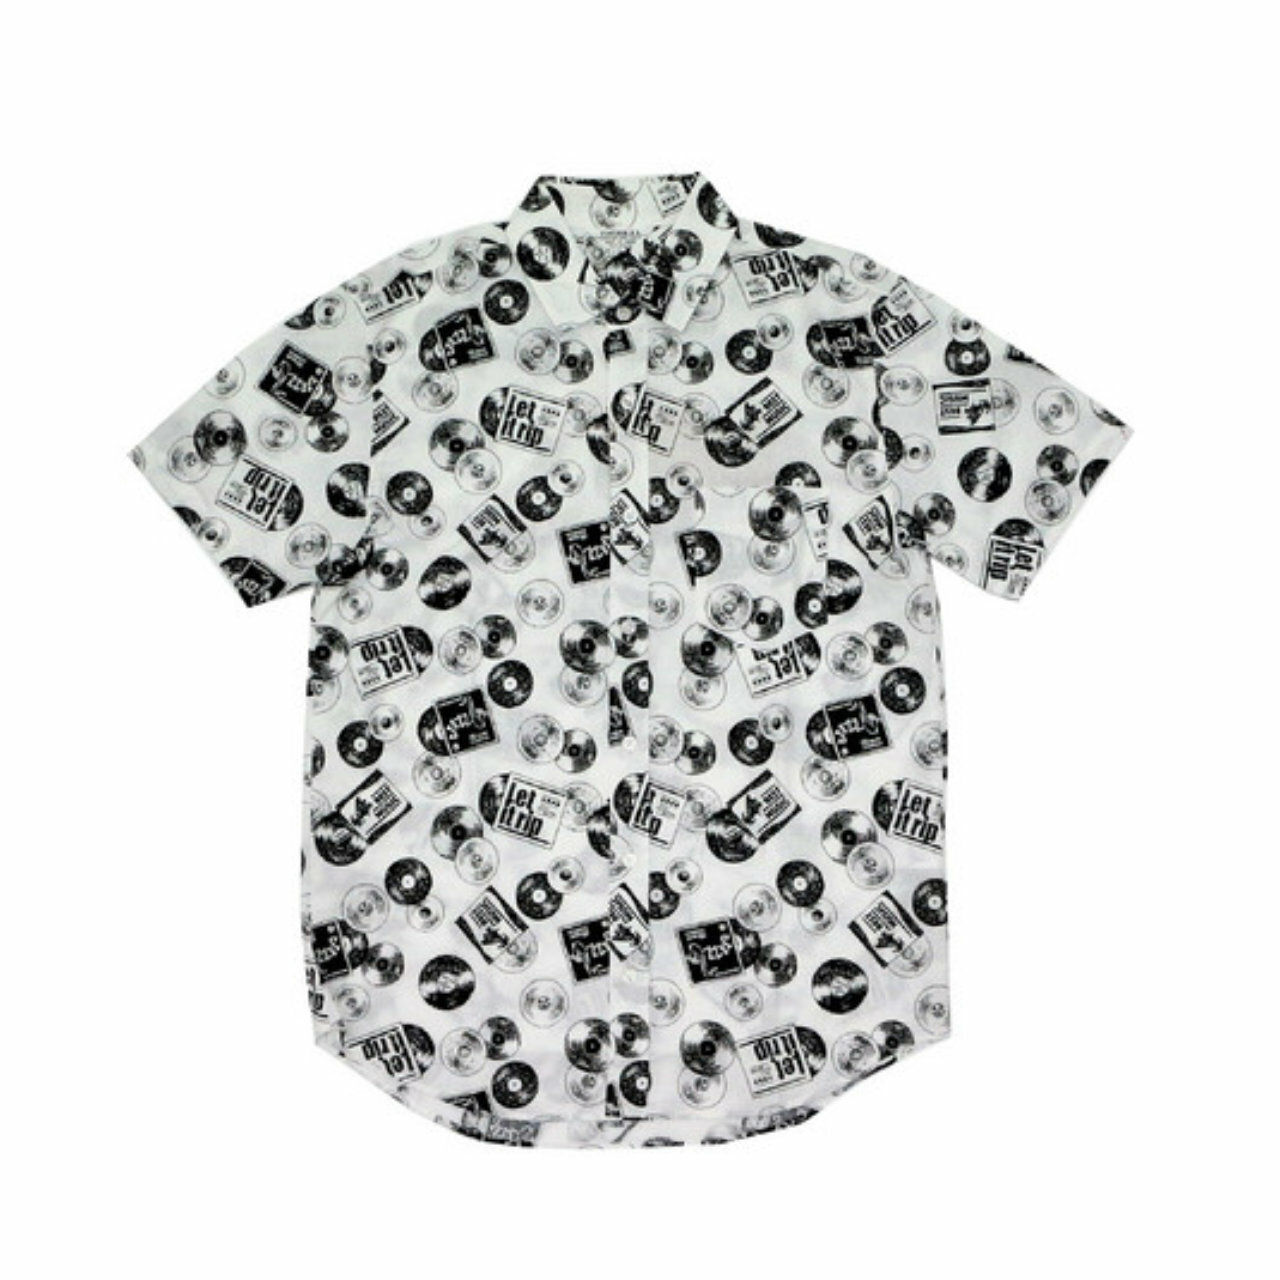 Vinyl Print S/S Shirts | レコード 総柄 プリント 半袖シャツ 【VINTAGE EL】